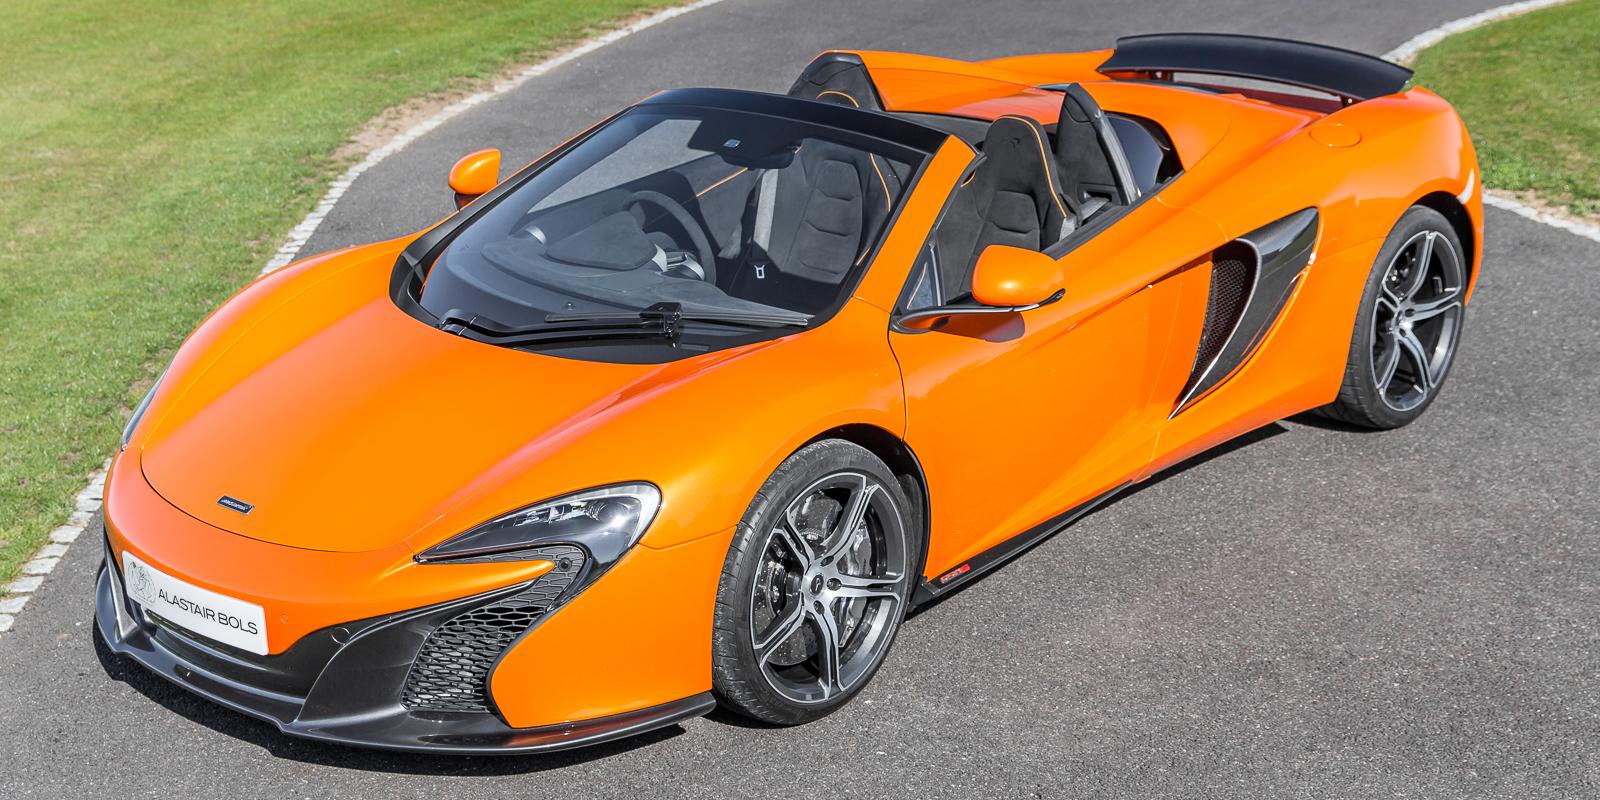 McLaren 650S Spider – Toracco Orange